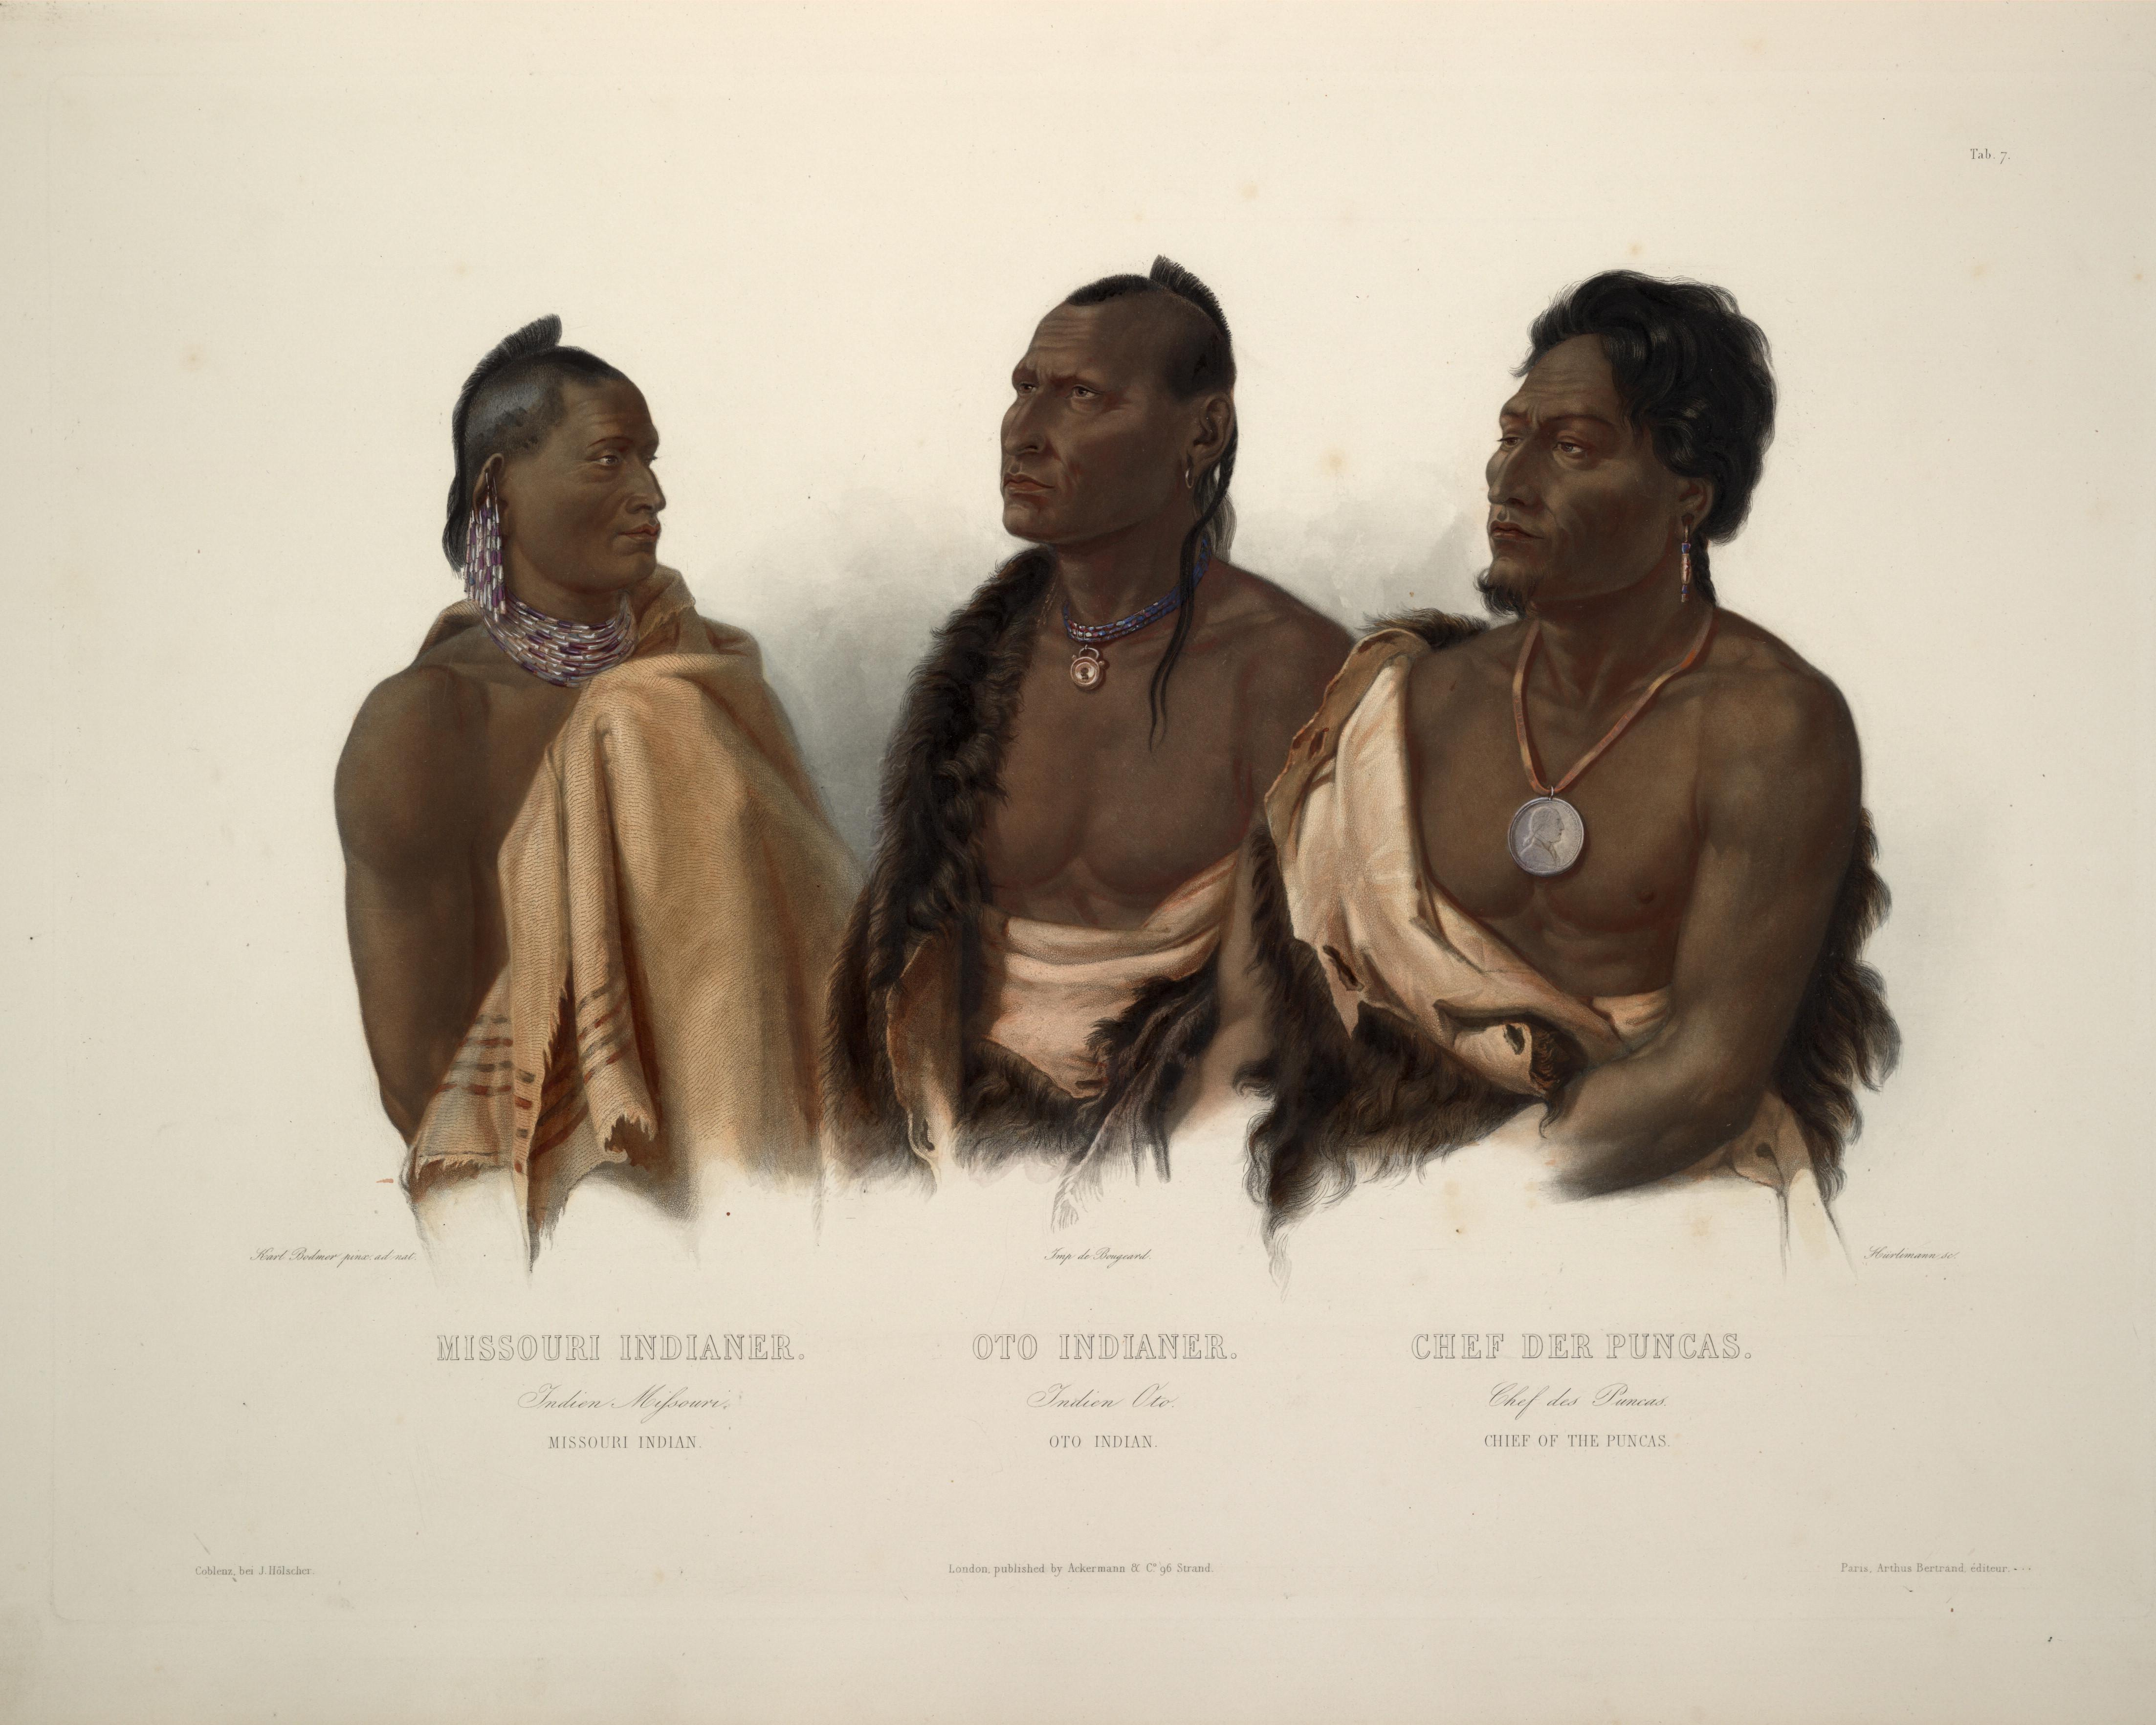 Otoe tribe - Wikipedia, the free encyclopediaotoe village